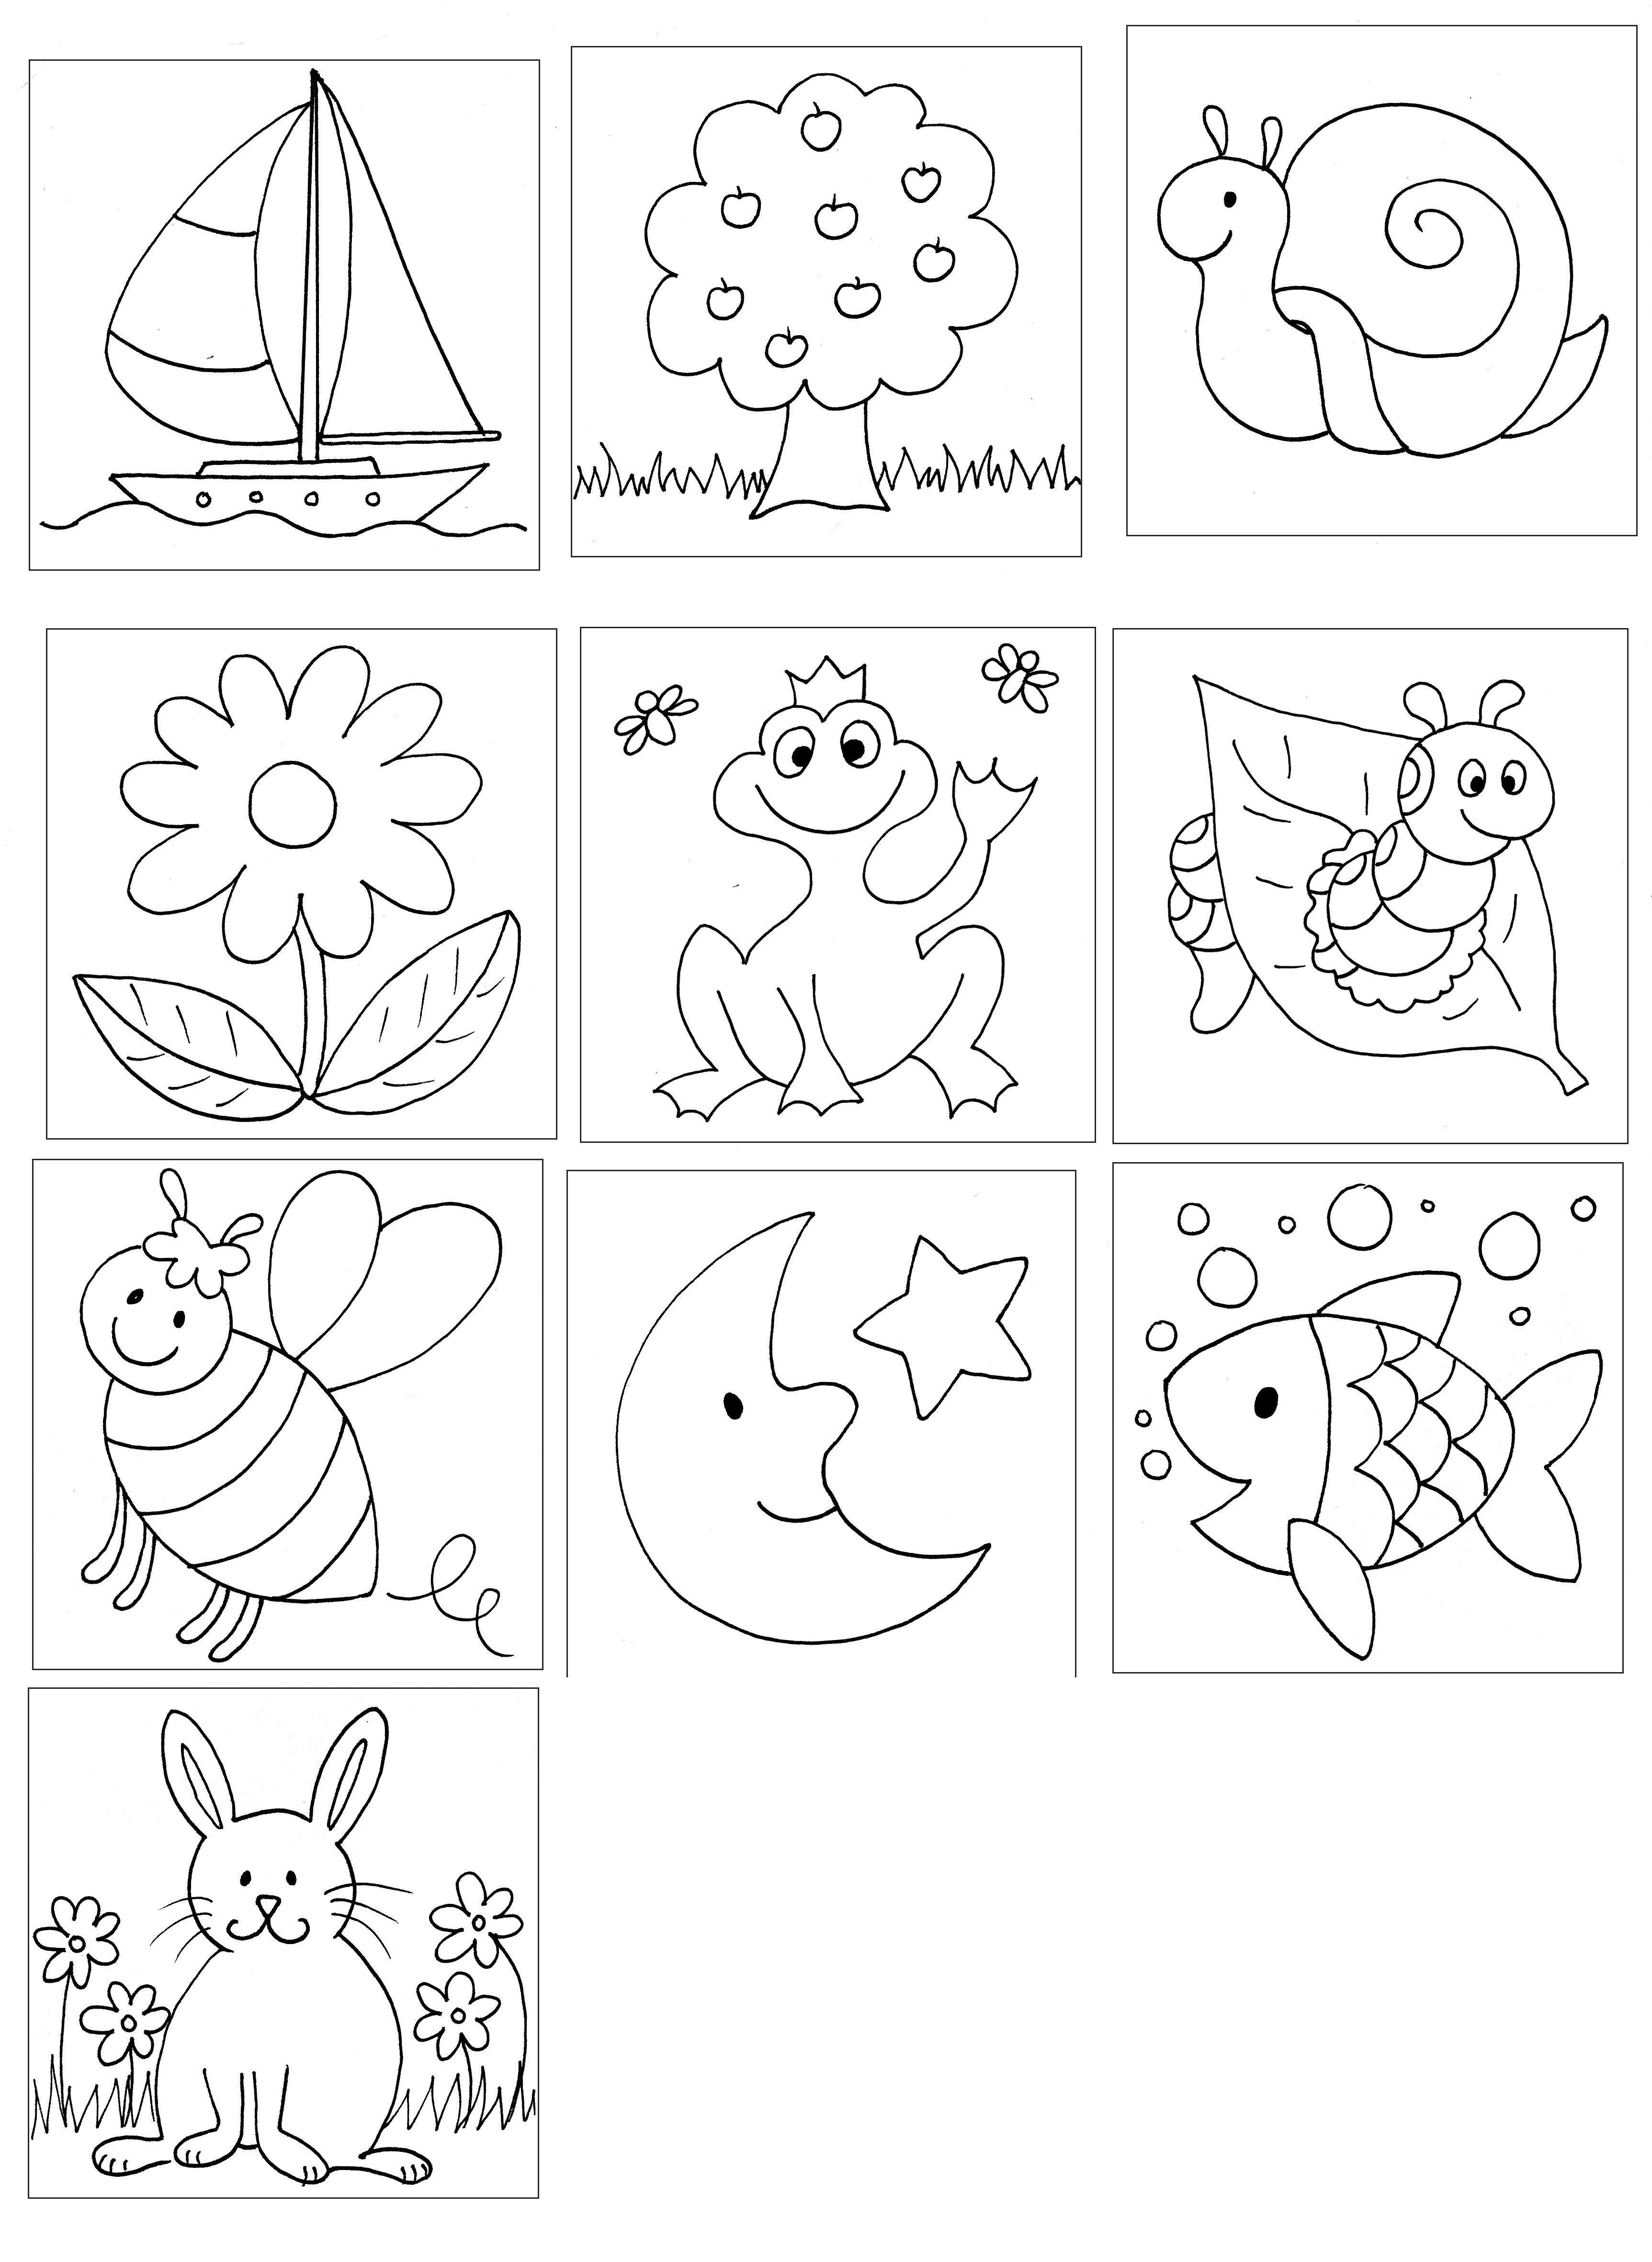 Mandala Zum Ausdrucken Rosen Genial Hahn Malvorlagen Ausdrucken Best Rosen Ausmalbilder Bilder